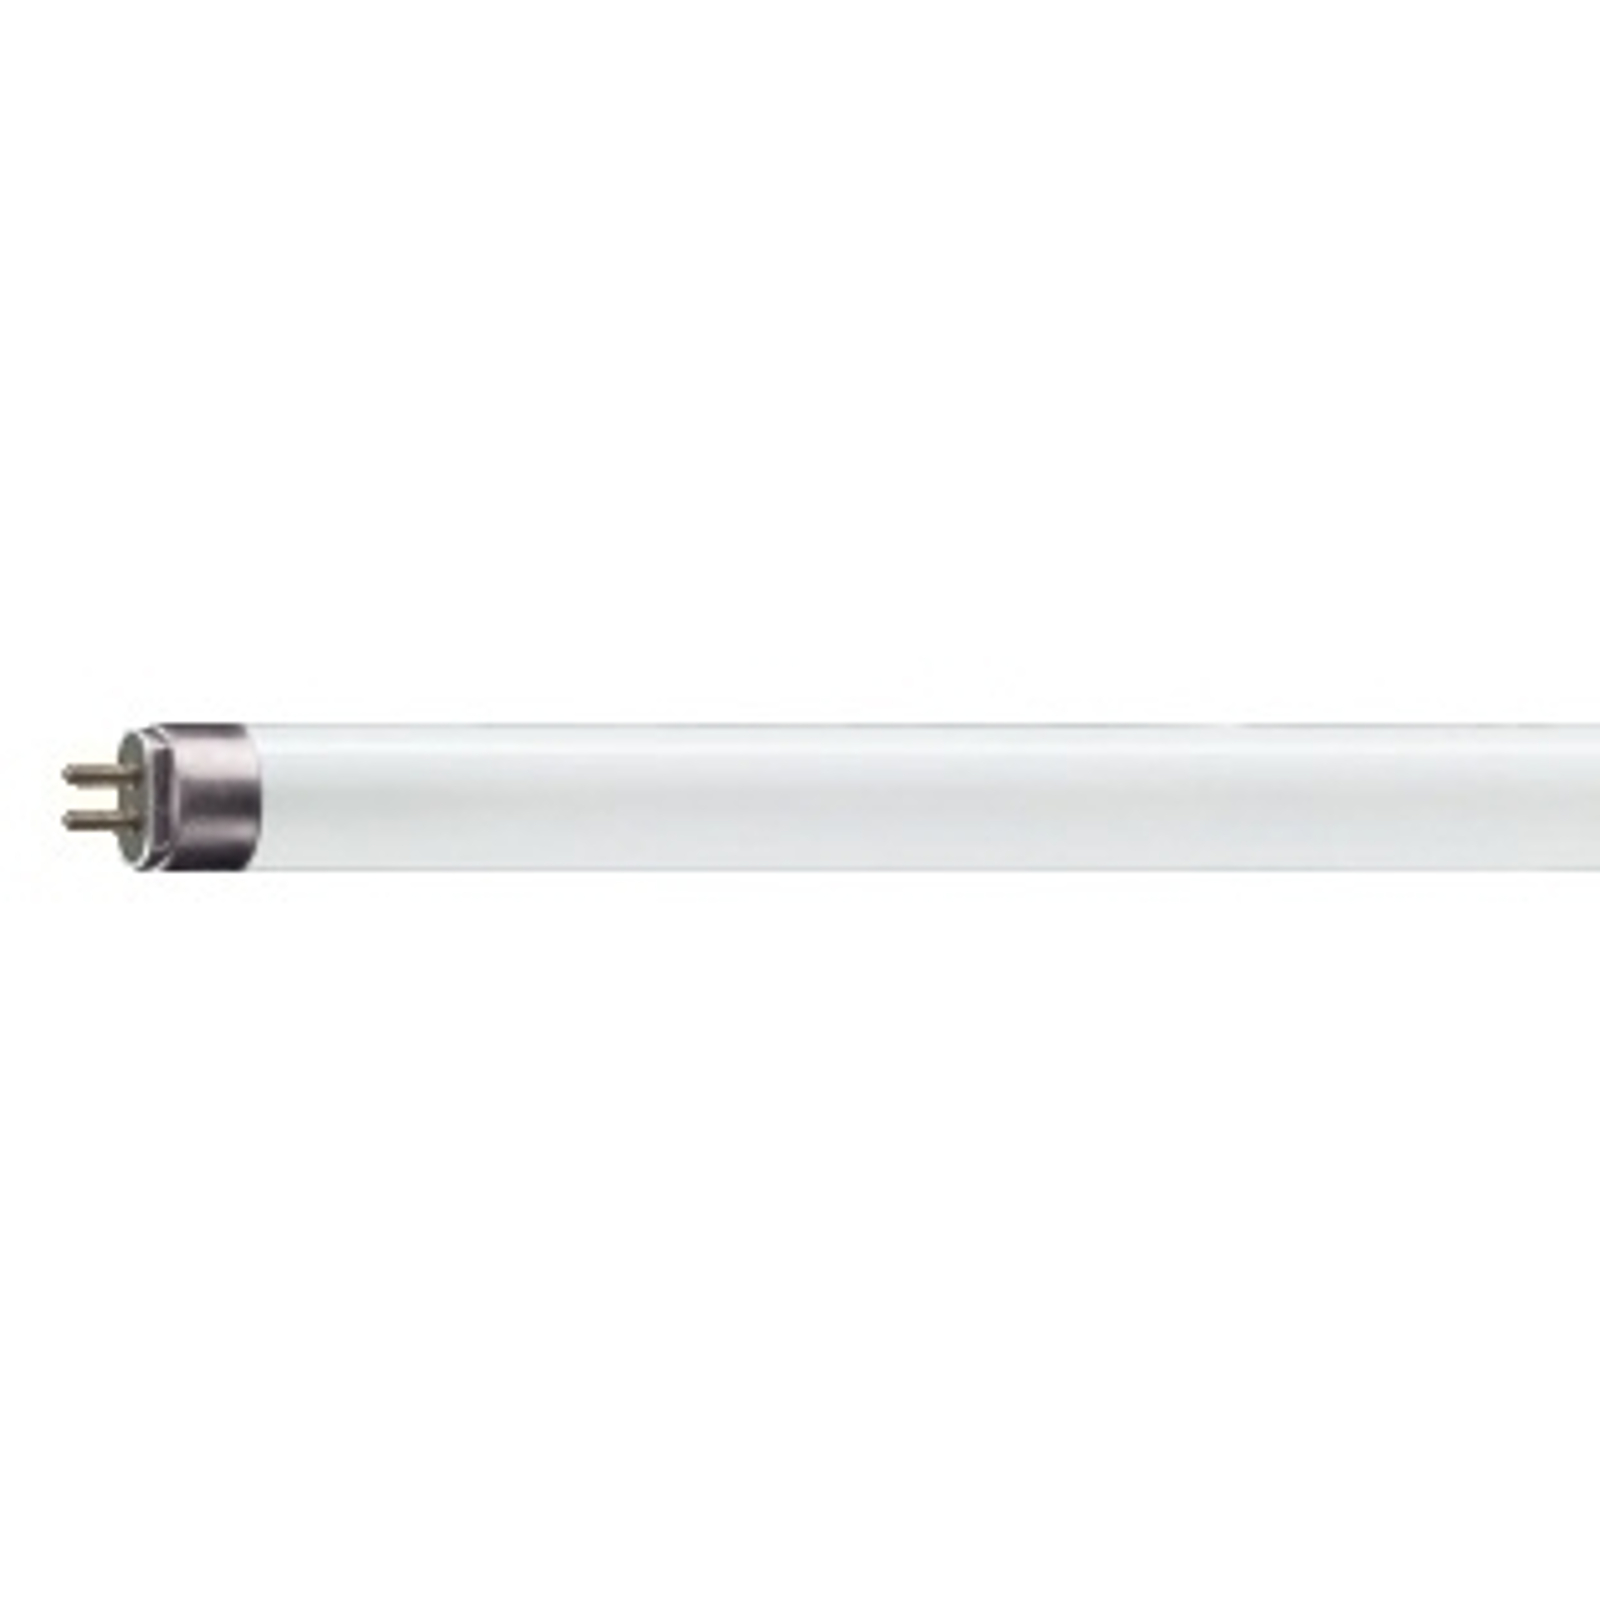 Philips Master G5 T5 Mini Leuchtstoffröhre 8W 765